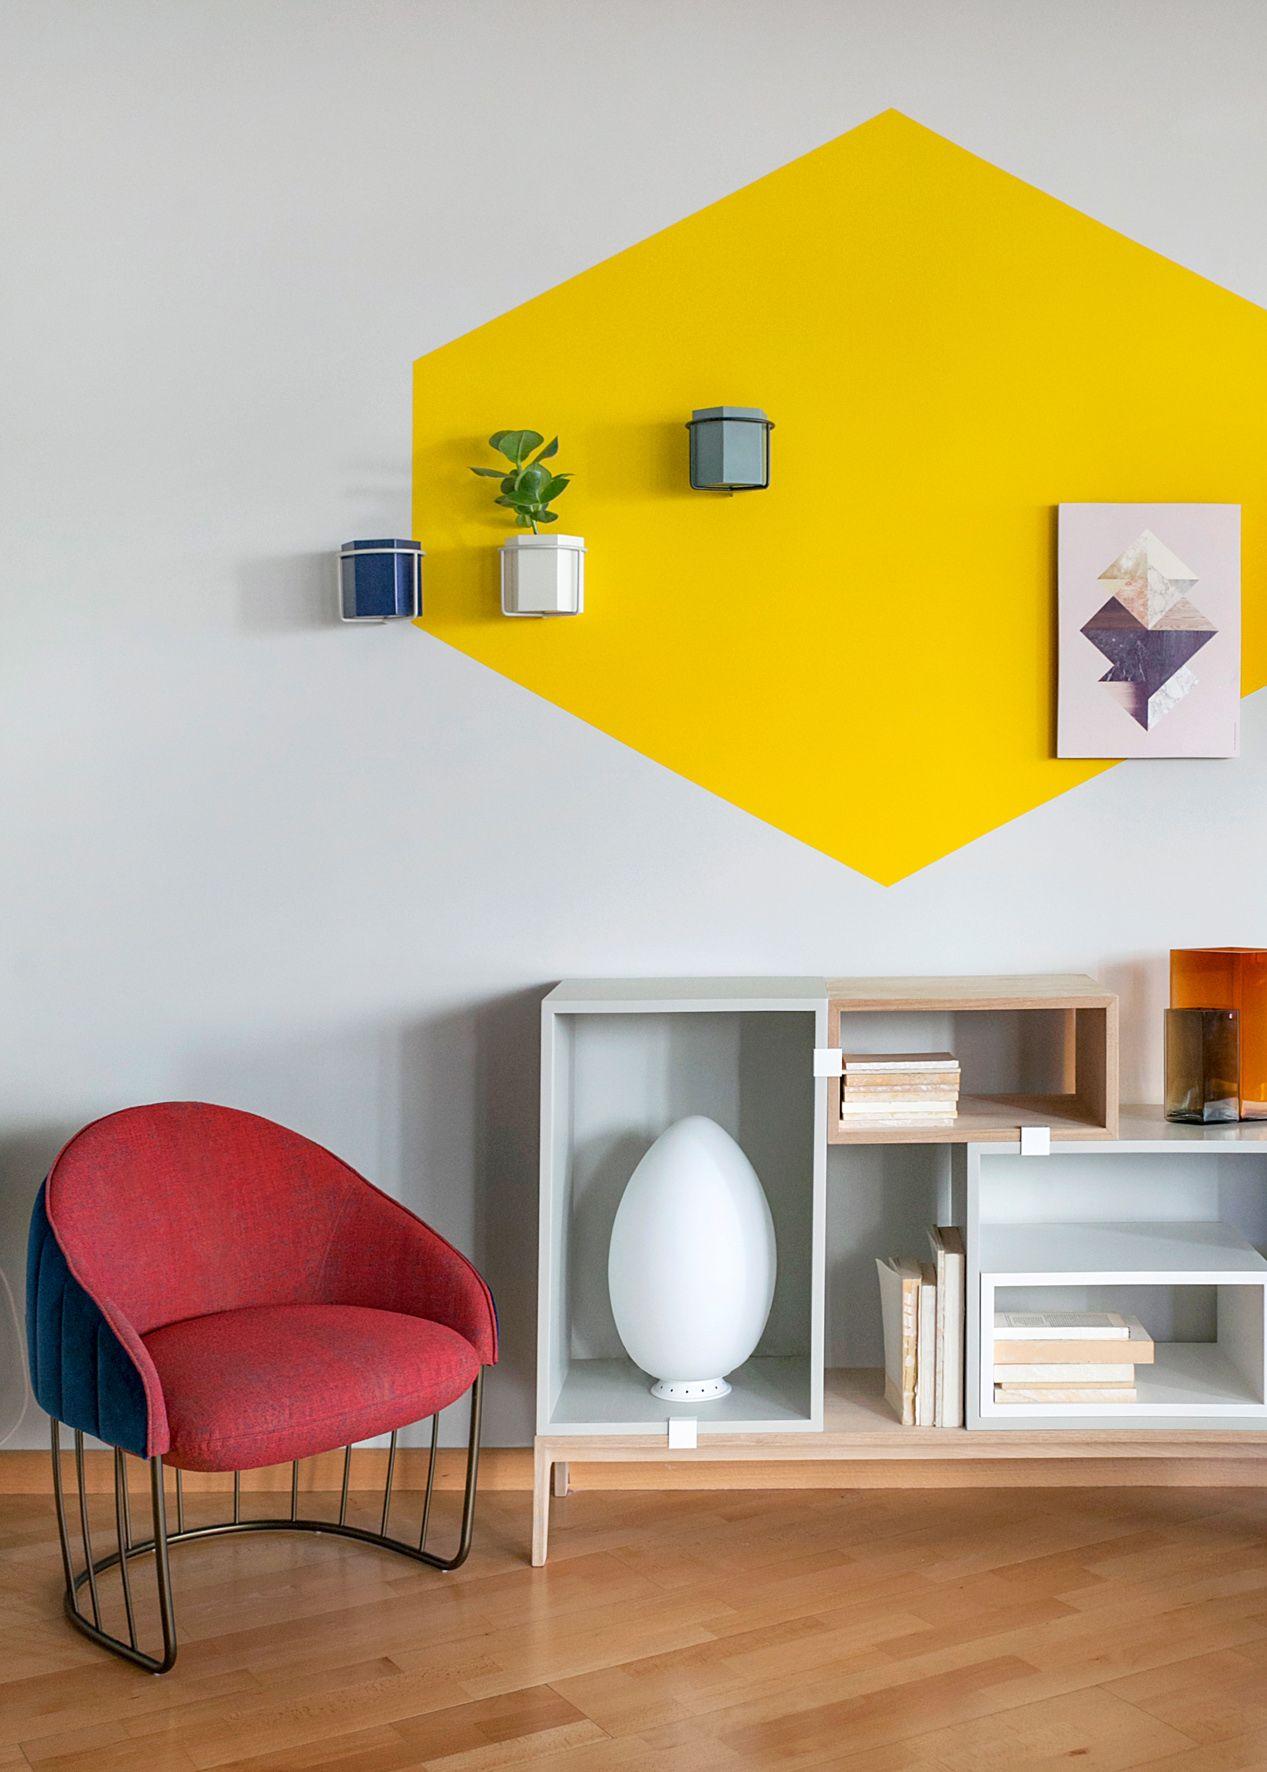 La casa sueca proyecto 21 renovaci n de sal n newprojects - La casa sueca ...